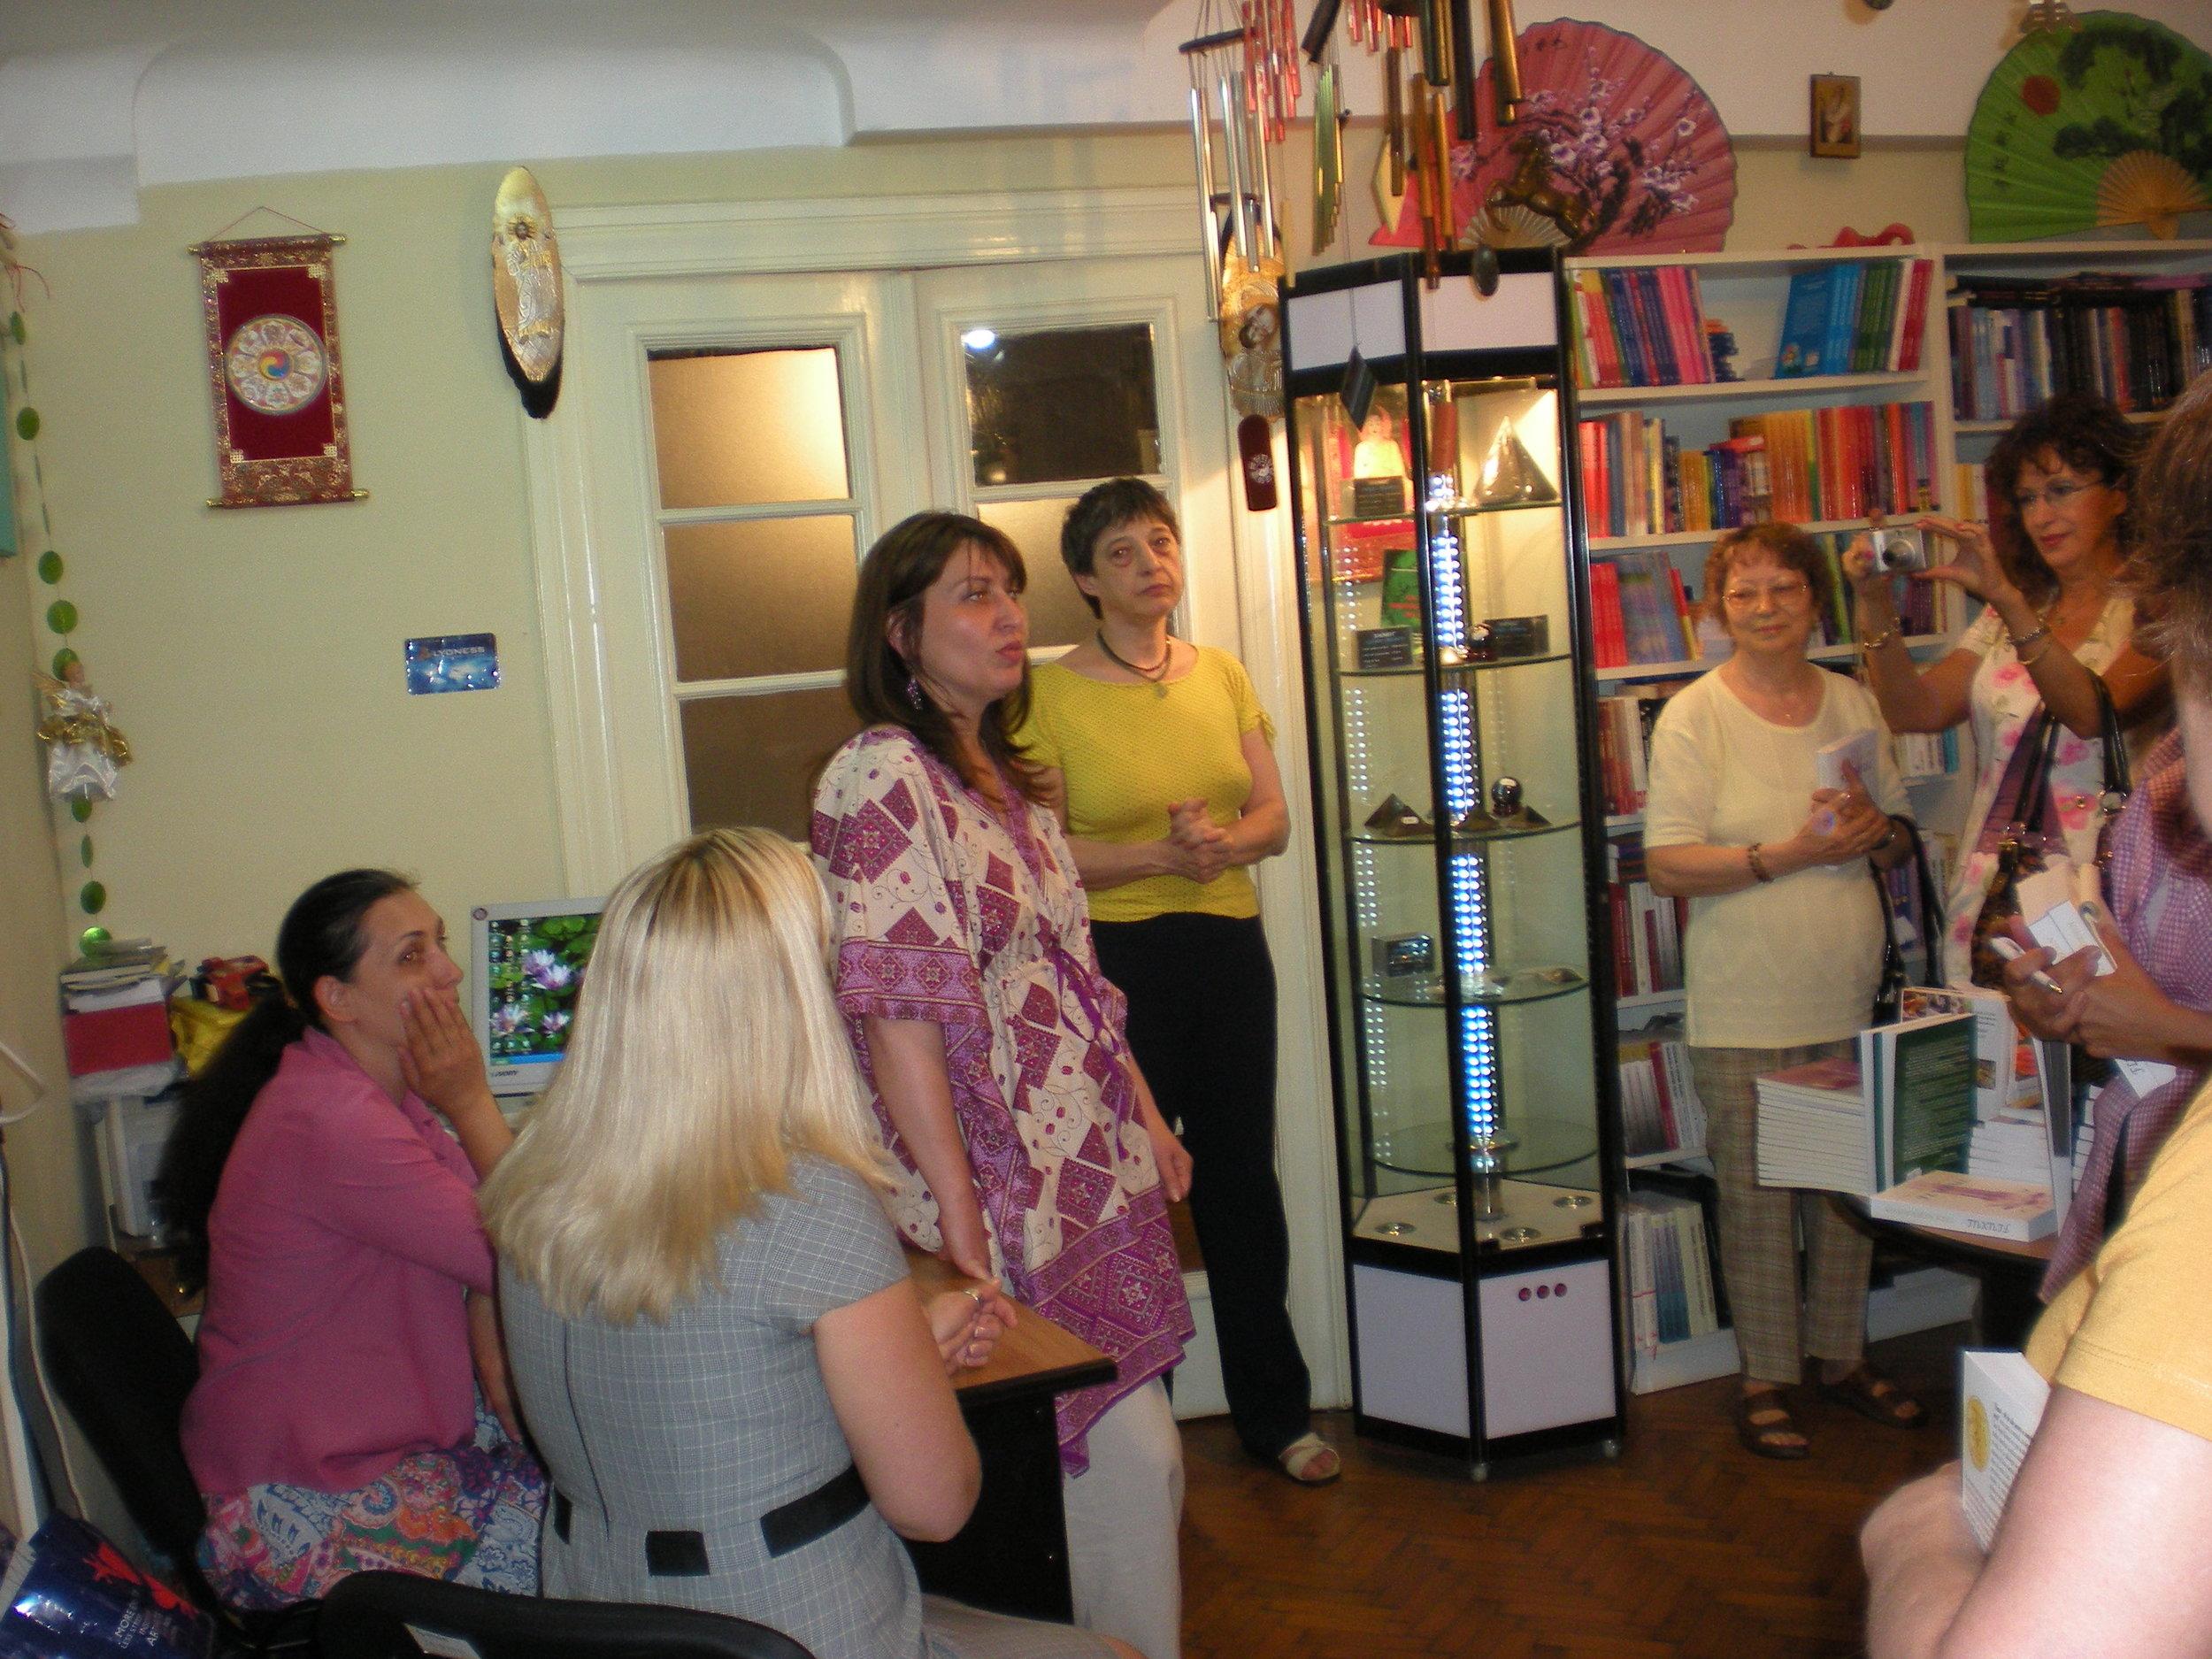 Tara during a book launch event in Romania